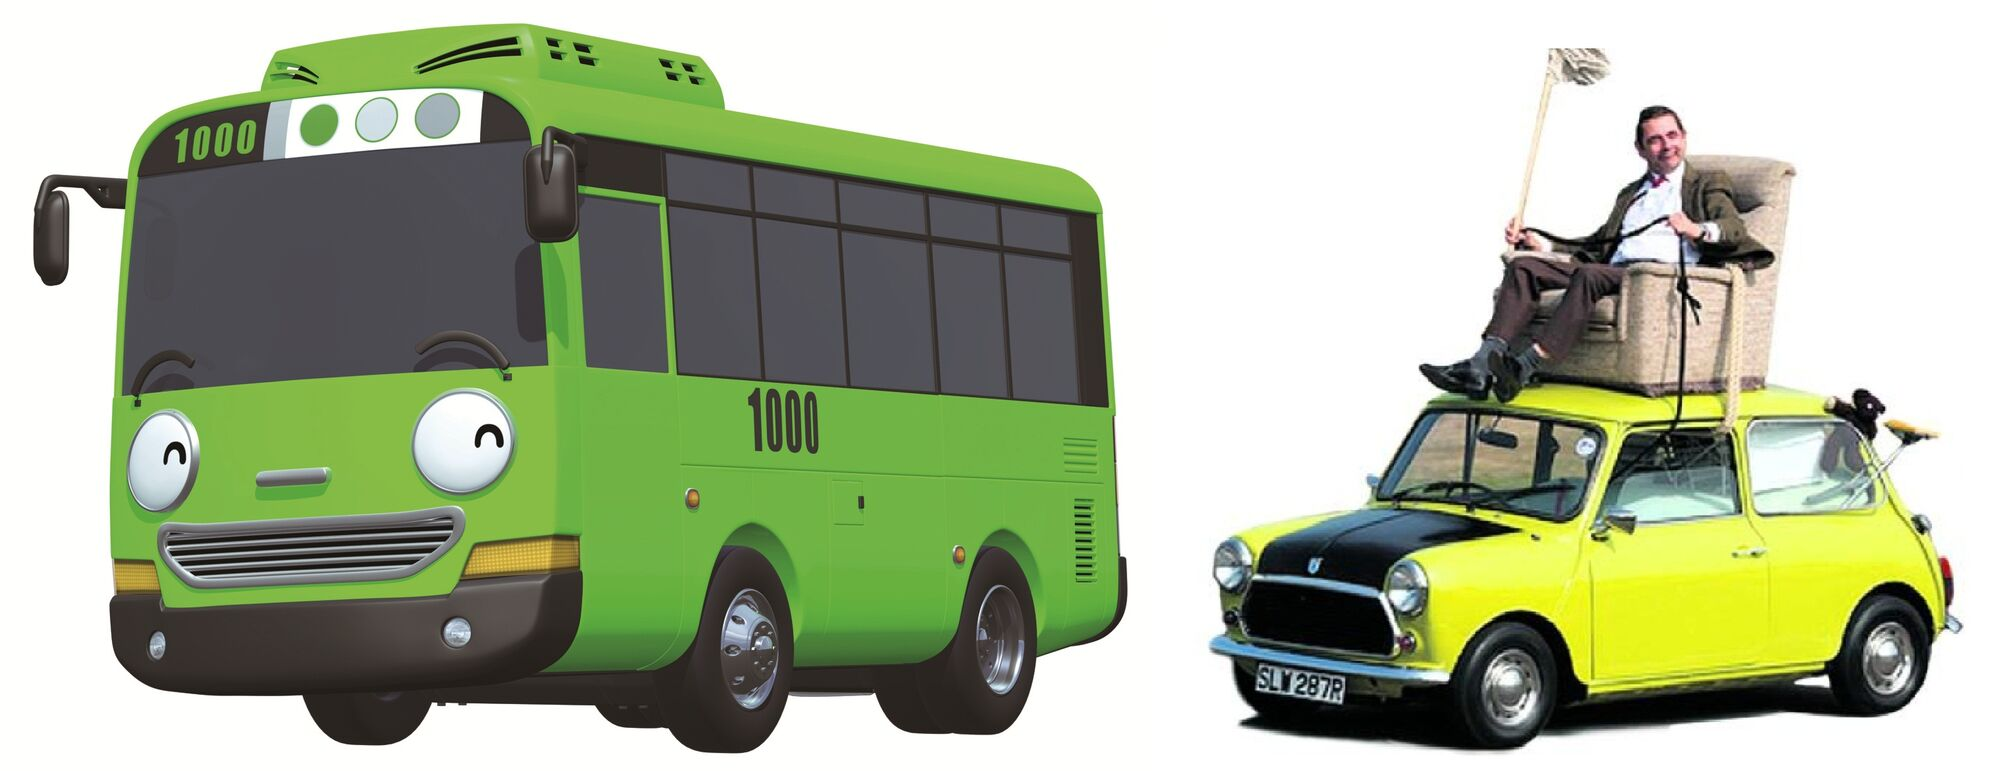 Gas Station With Drive Thru Car Wash >> Image - 1380536265 Tayo The Little Bus Rogi VS Mr Bean Austin Mini Cooper Car Mini 1000 Cars ...